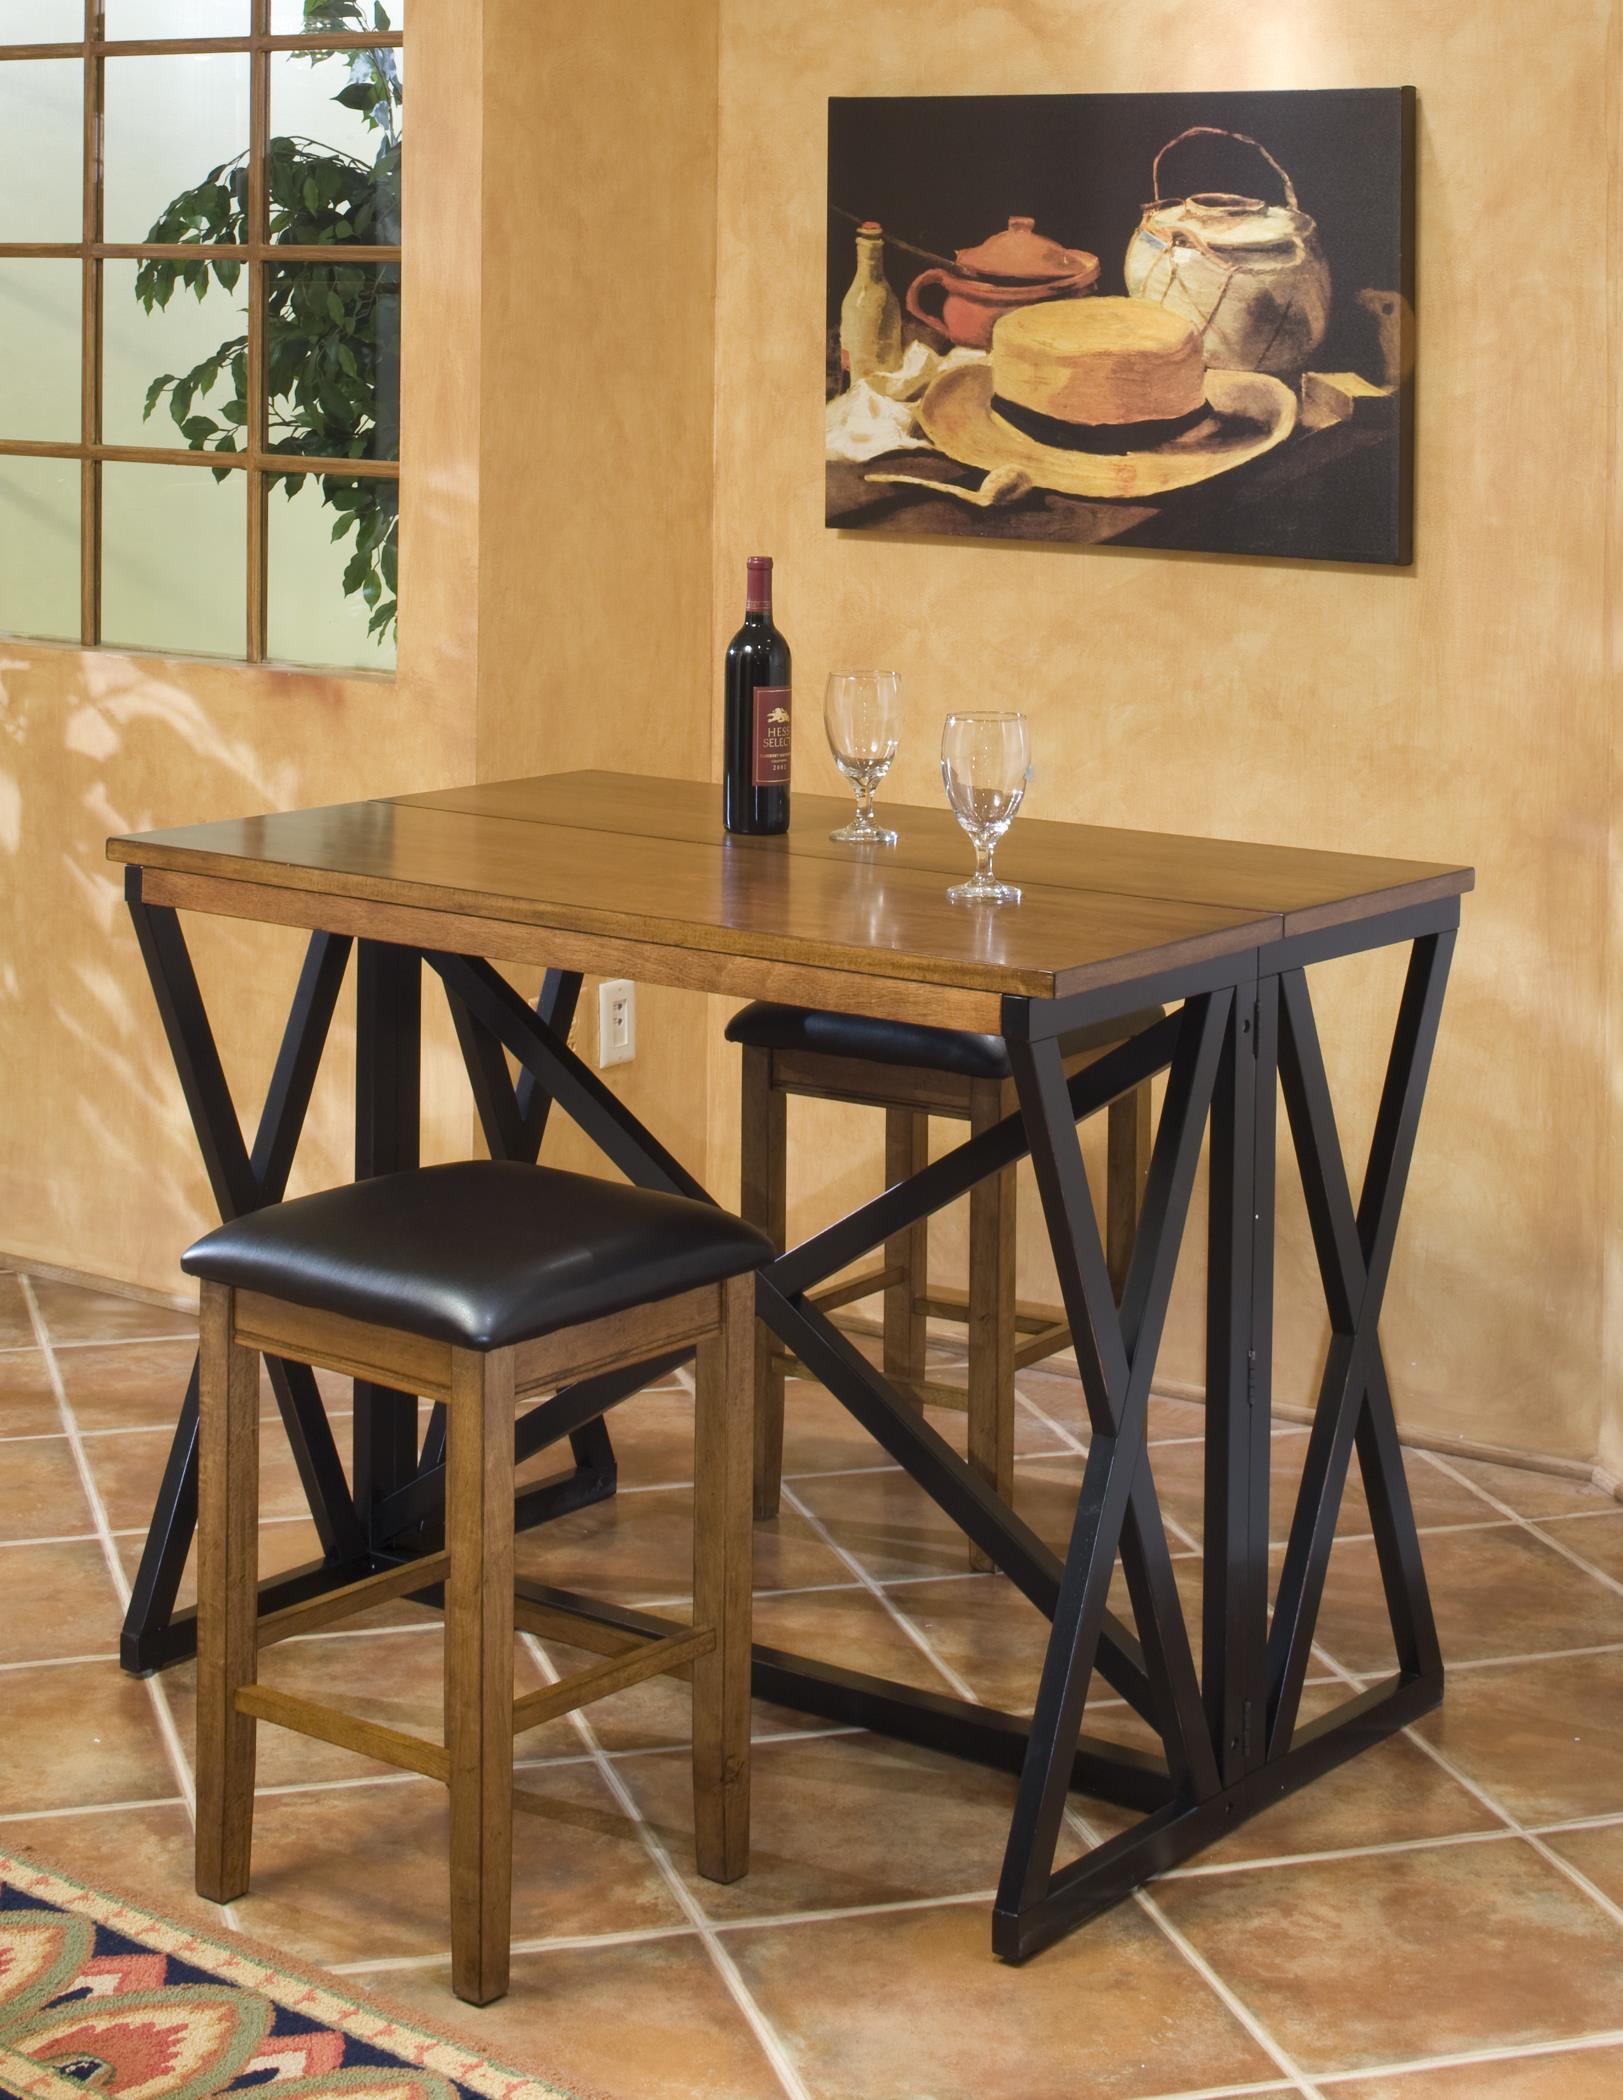 lighting entity dining breakfast grey galley bar ikea ideas room stools kitchen table island small